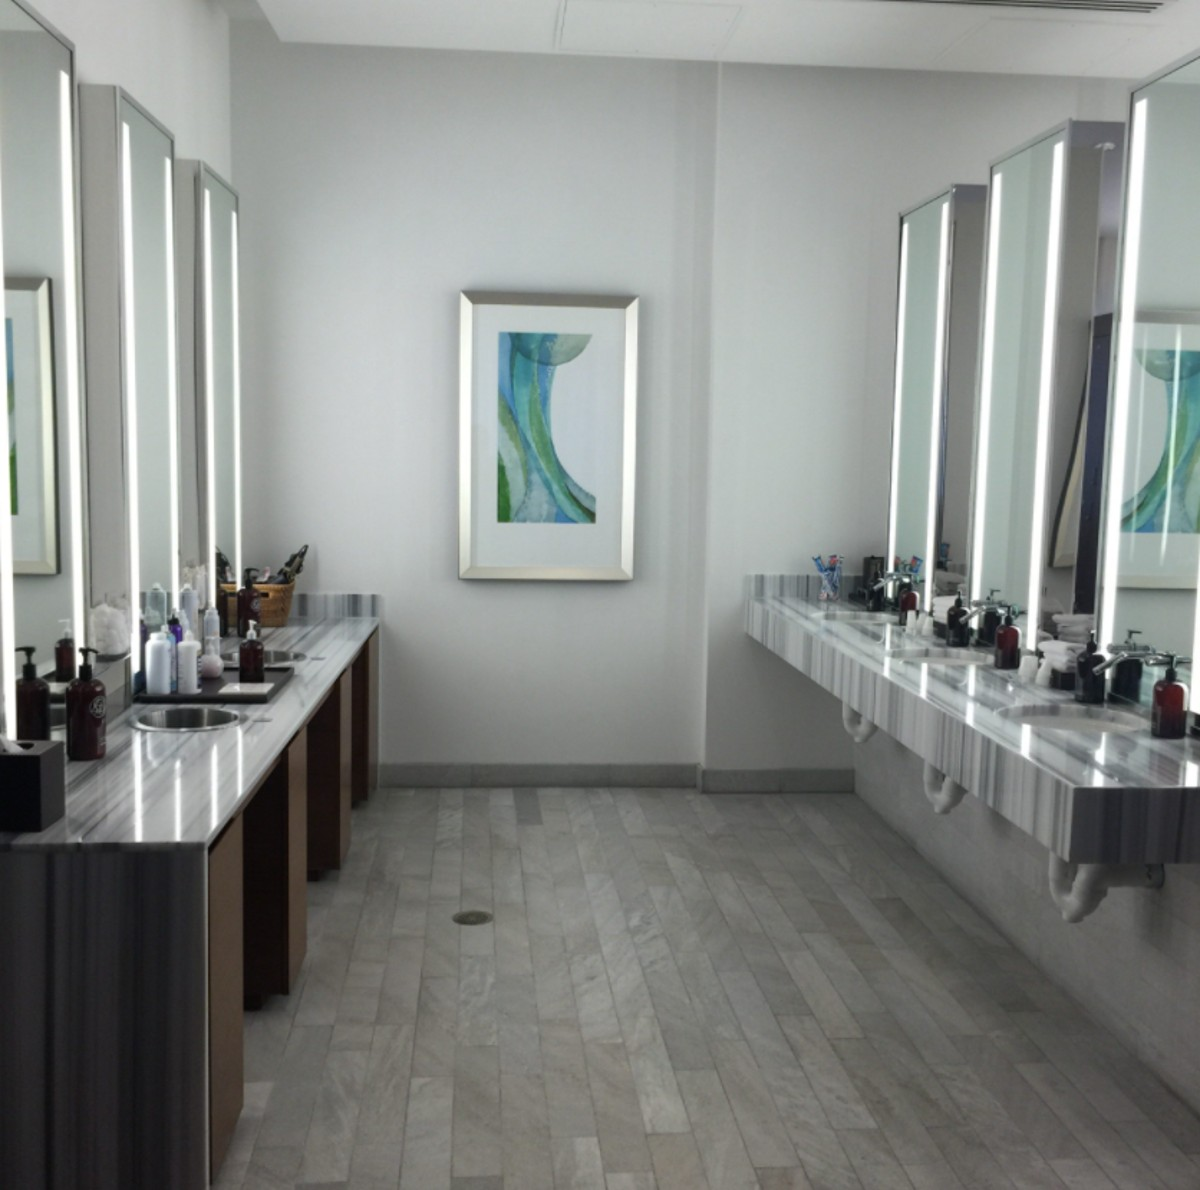 Vdara Spa Bathroom